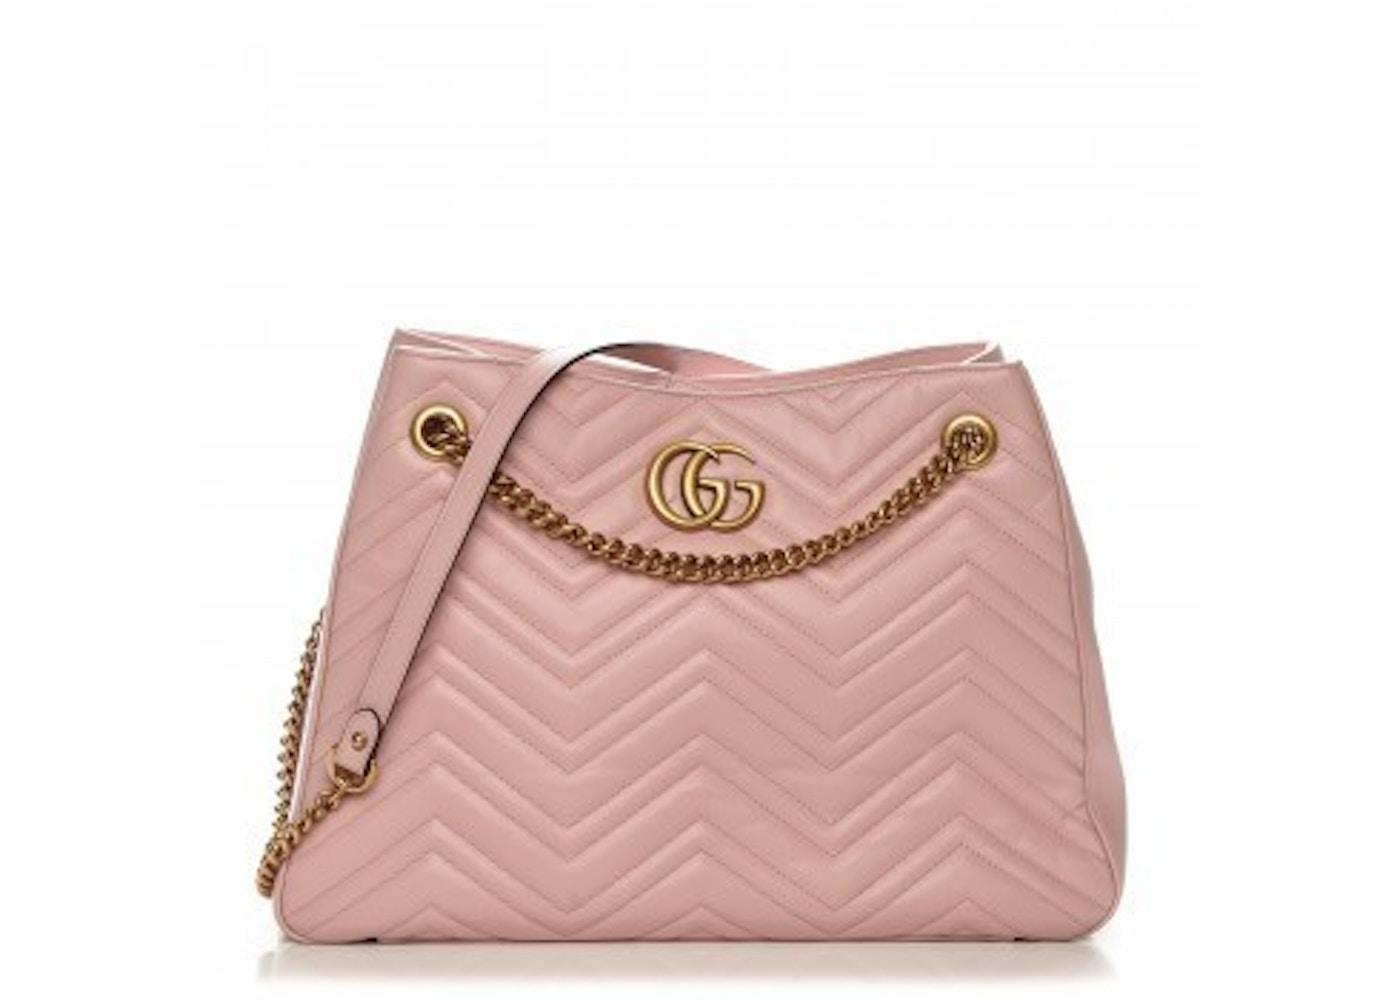 Gucci Gg Marmont Shoulder Bag Matelasse Medium Light Pink